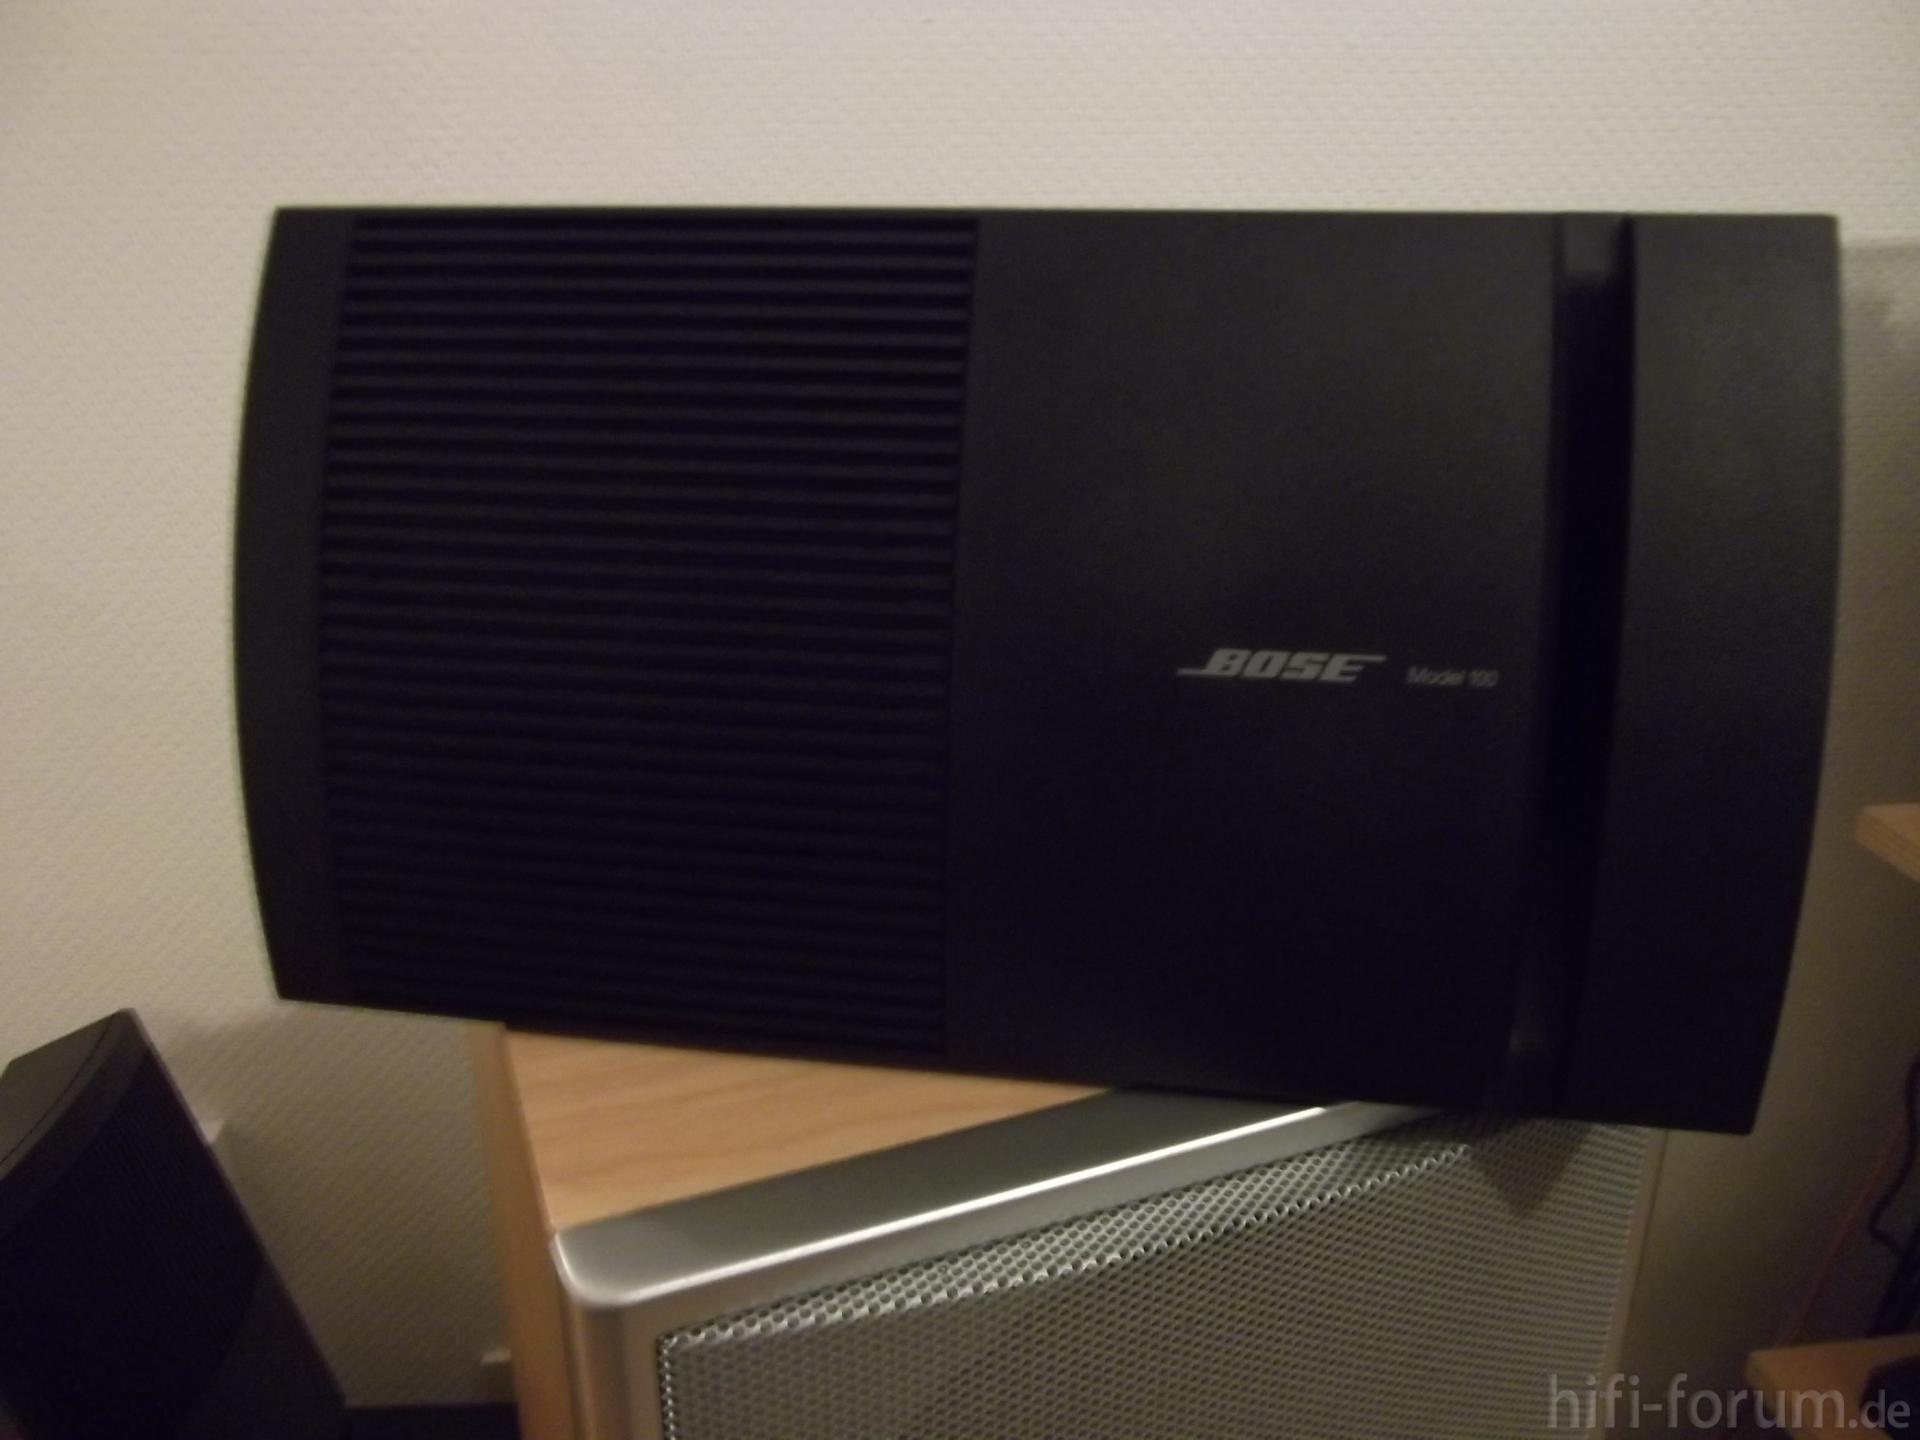 Bose Model 100 Im Bad Lautsprecher Hifi Forum